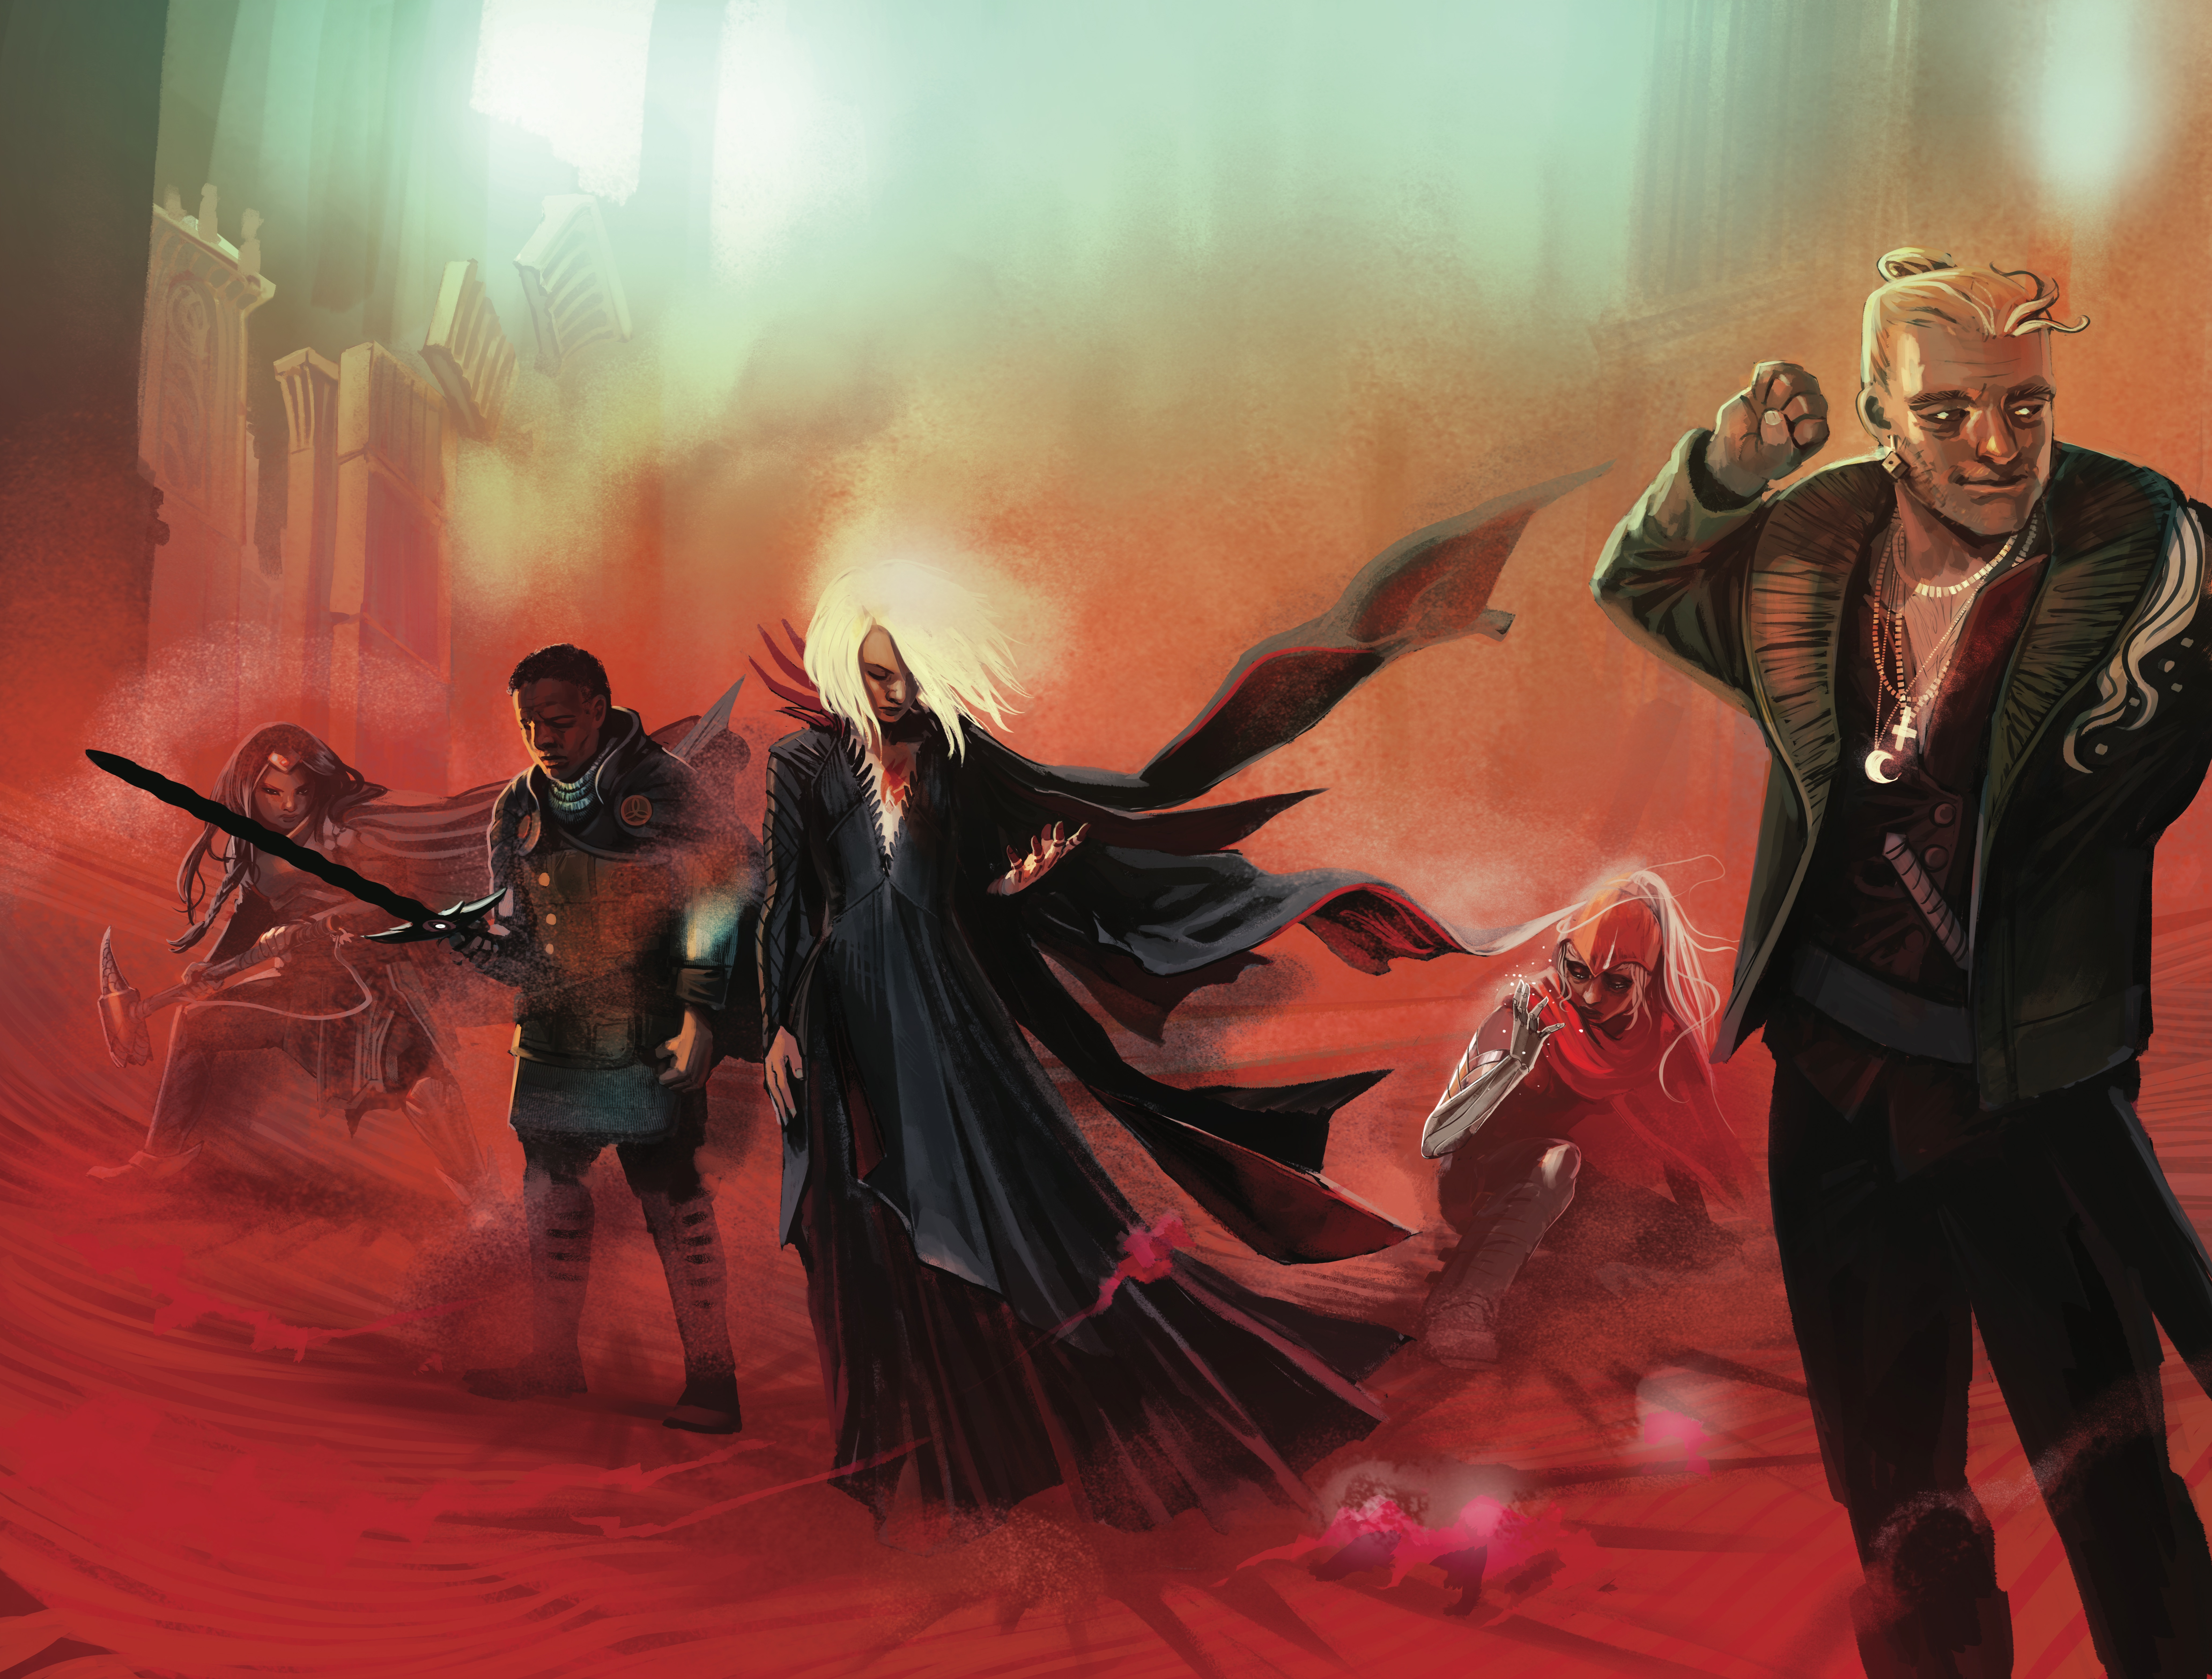 We played Die, the 'Goth Jumanji' game fueling Kieron Gillen's new RPG comic book